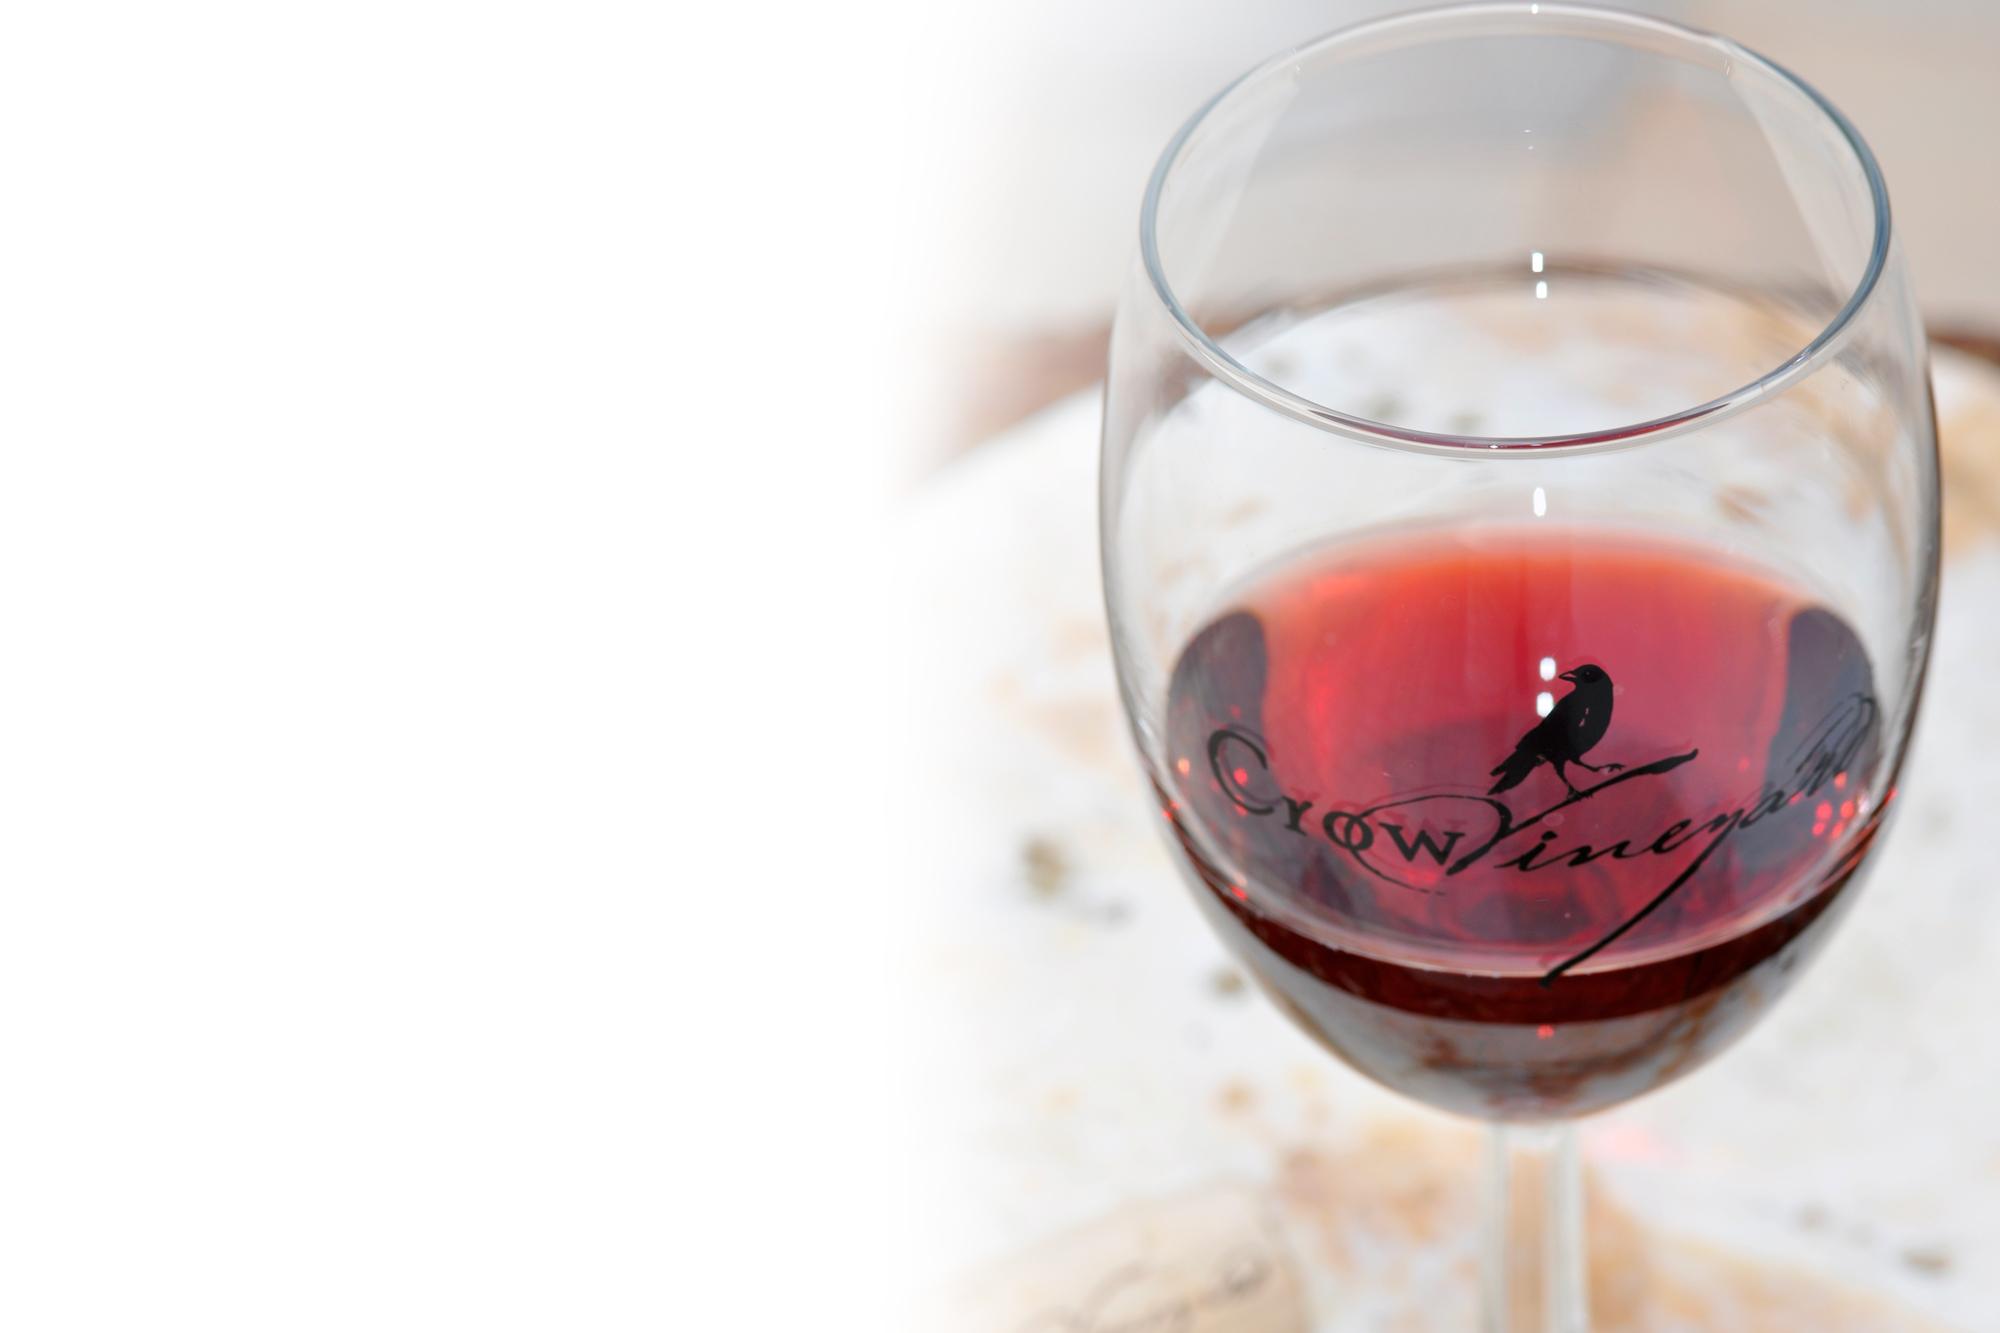 Crow Vineyard & Winery Merlot